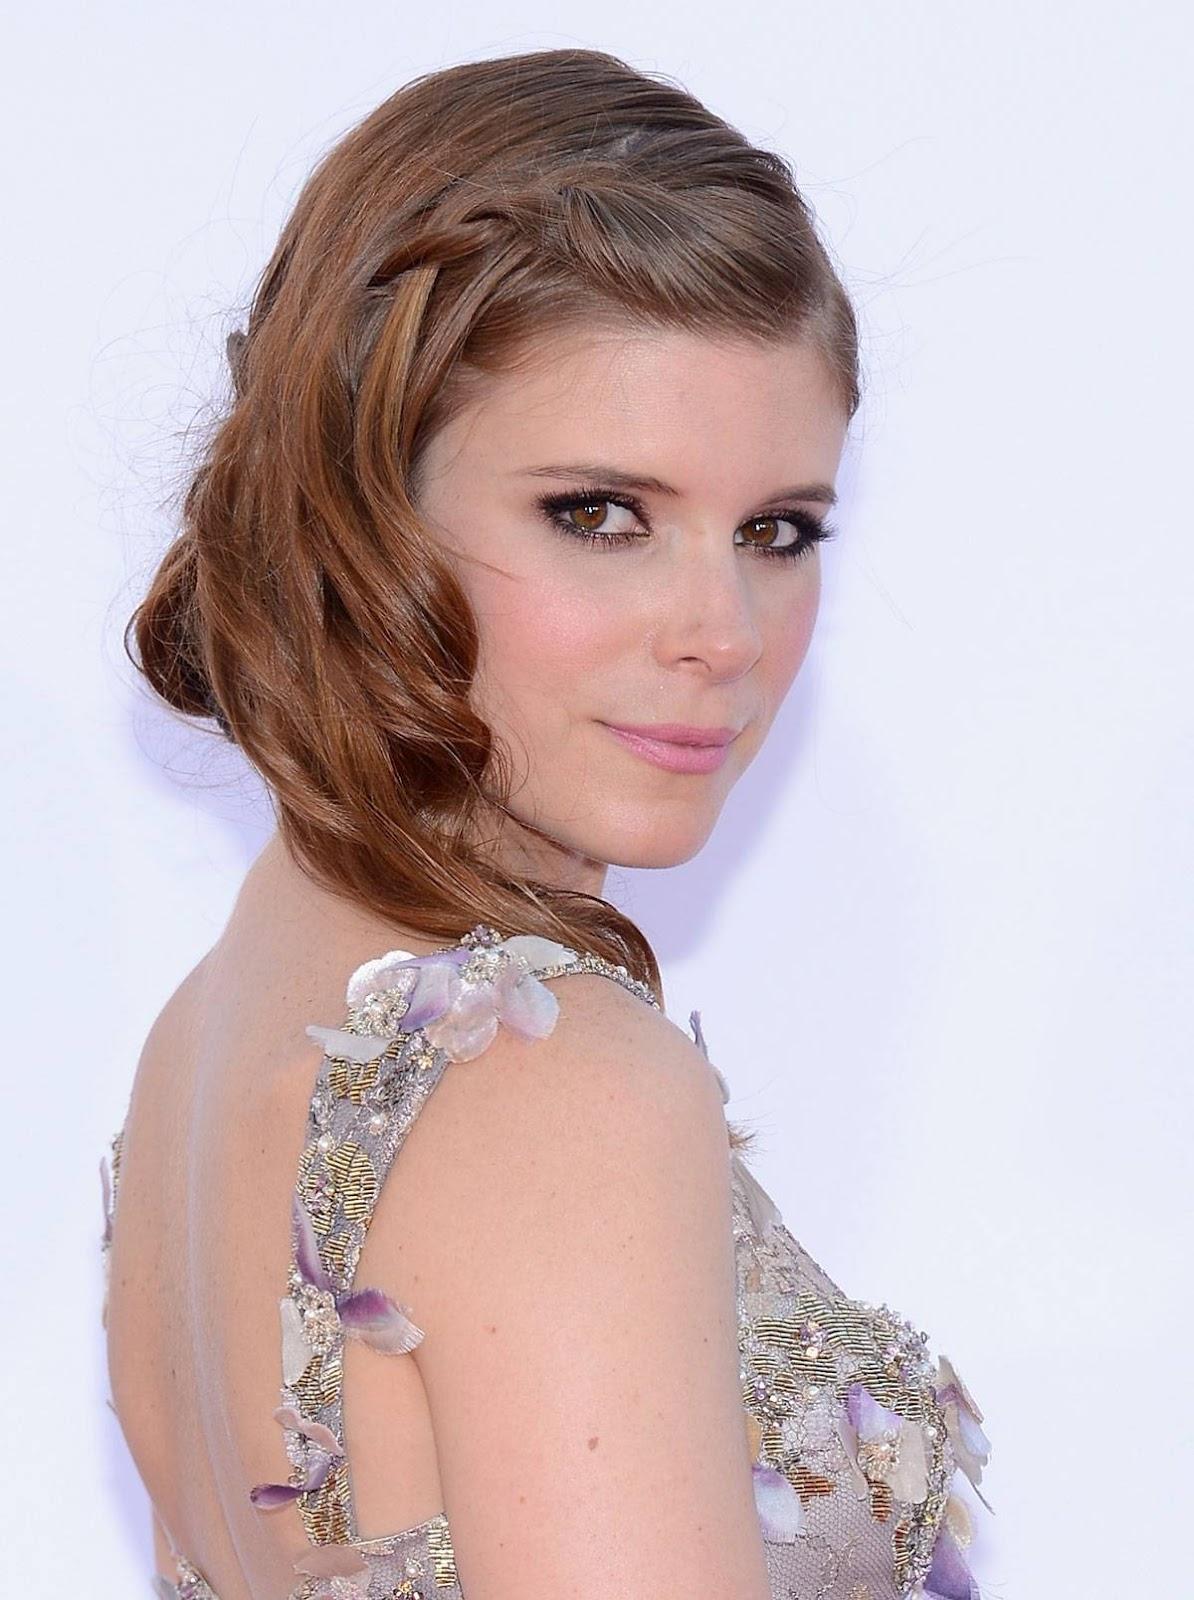 http://2.bp.blogspot.com/-kjmpYoxNjn0/UGNhyisxbYI/AAAAAAAAMnM/6-l7pIIT7W0/s1600/Kate-Mara-Primetime-Emmy-Awards-2012-Dress-6504.jpg